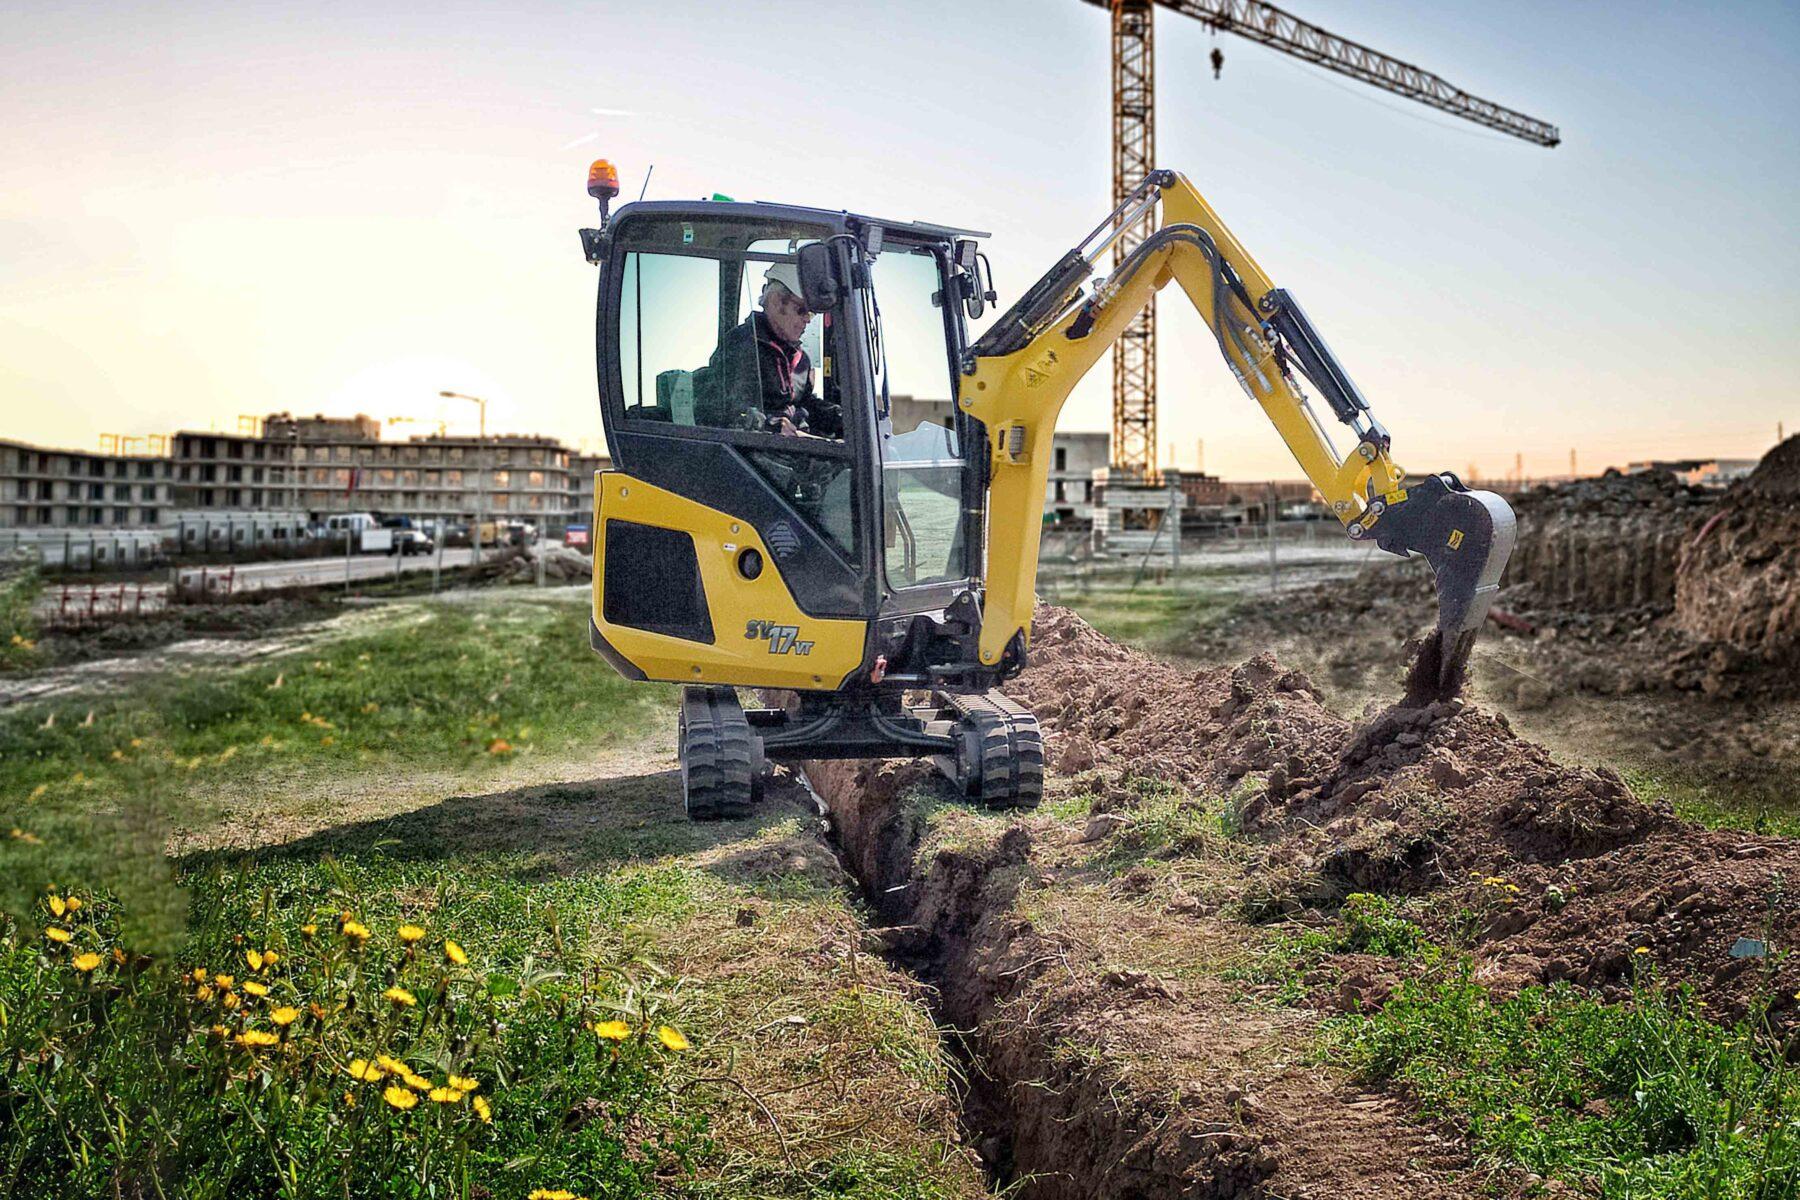 Yanmar SV17 Excavator